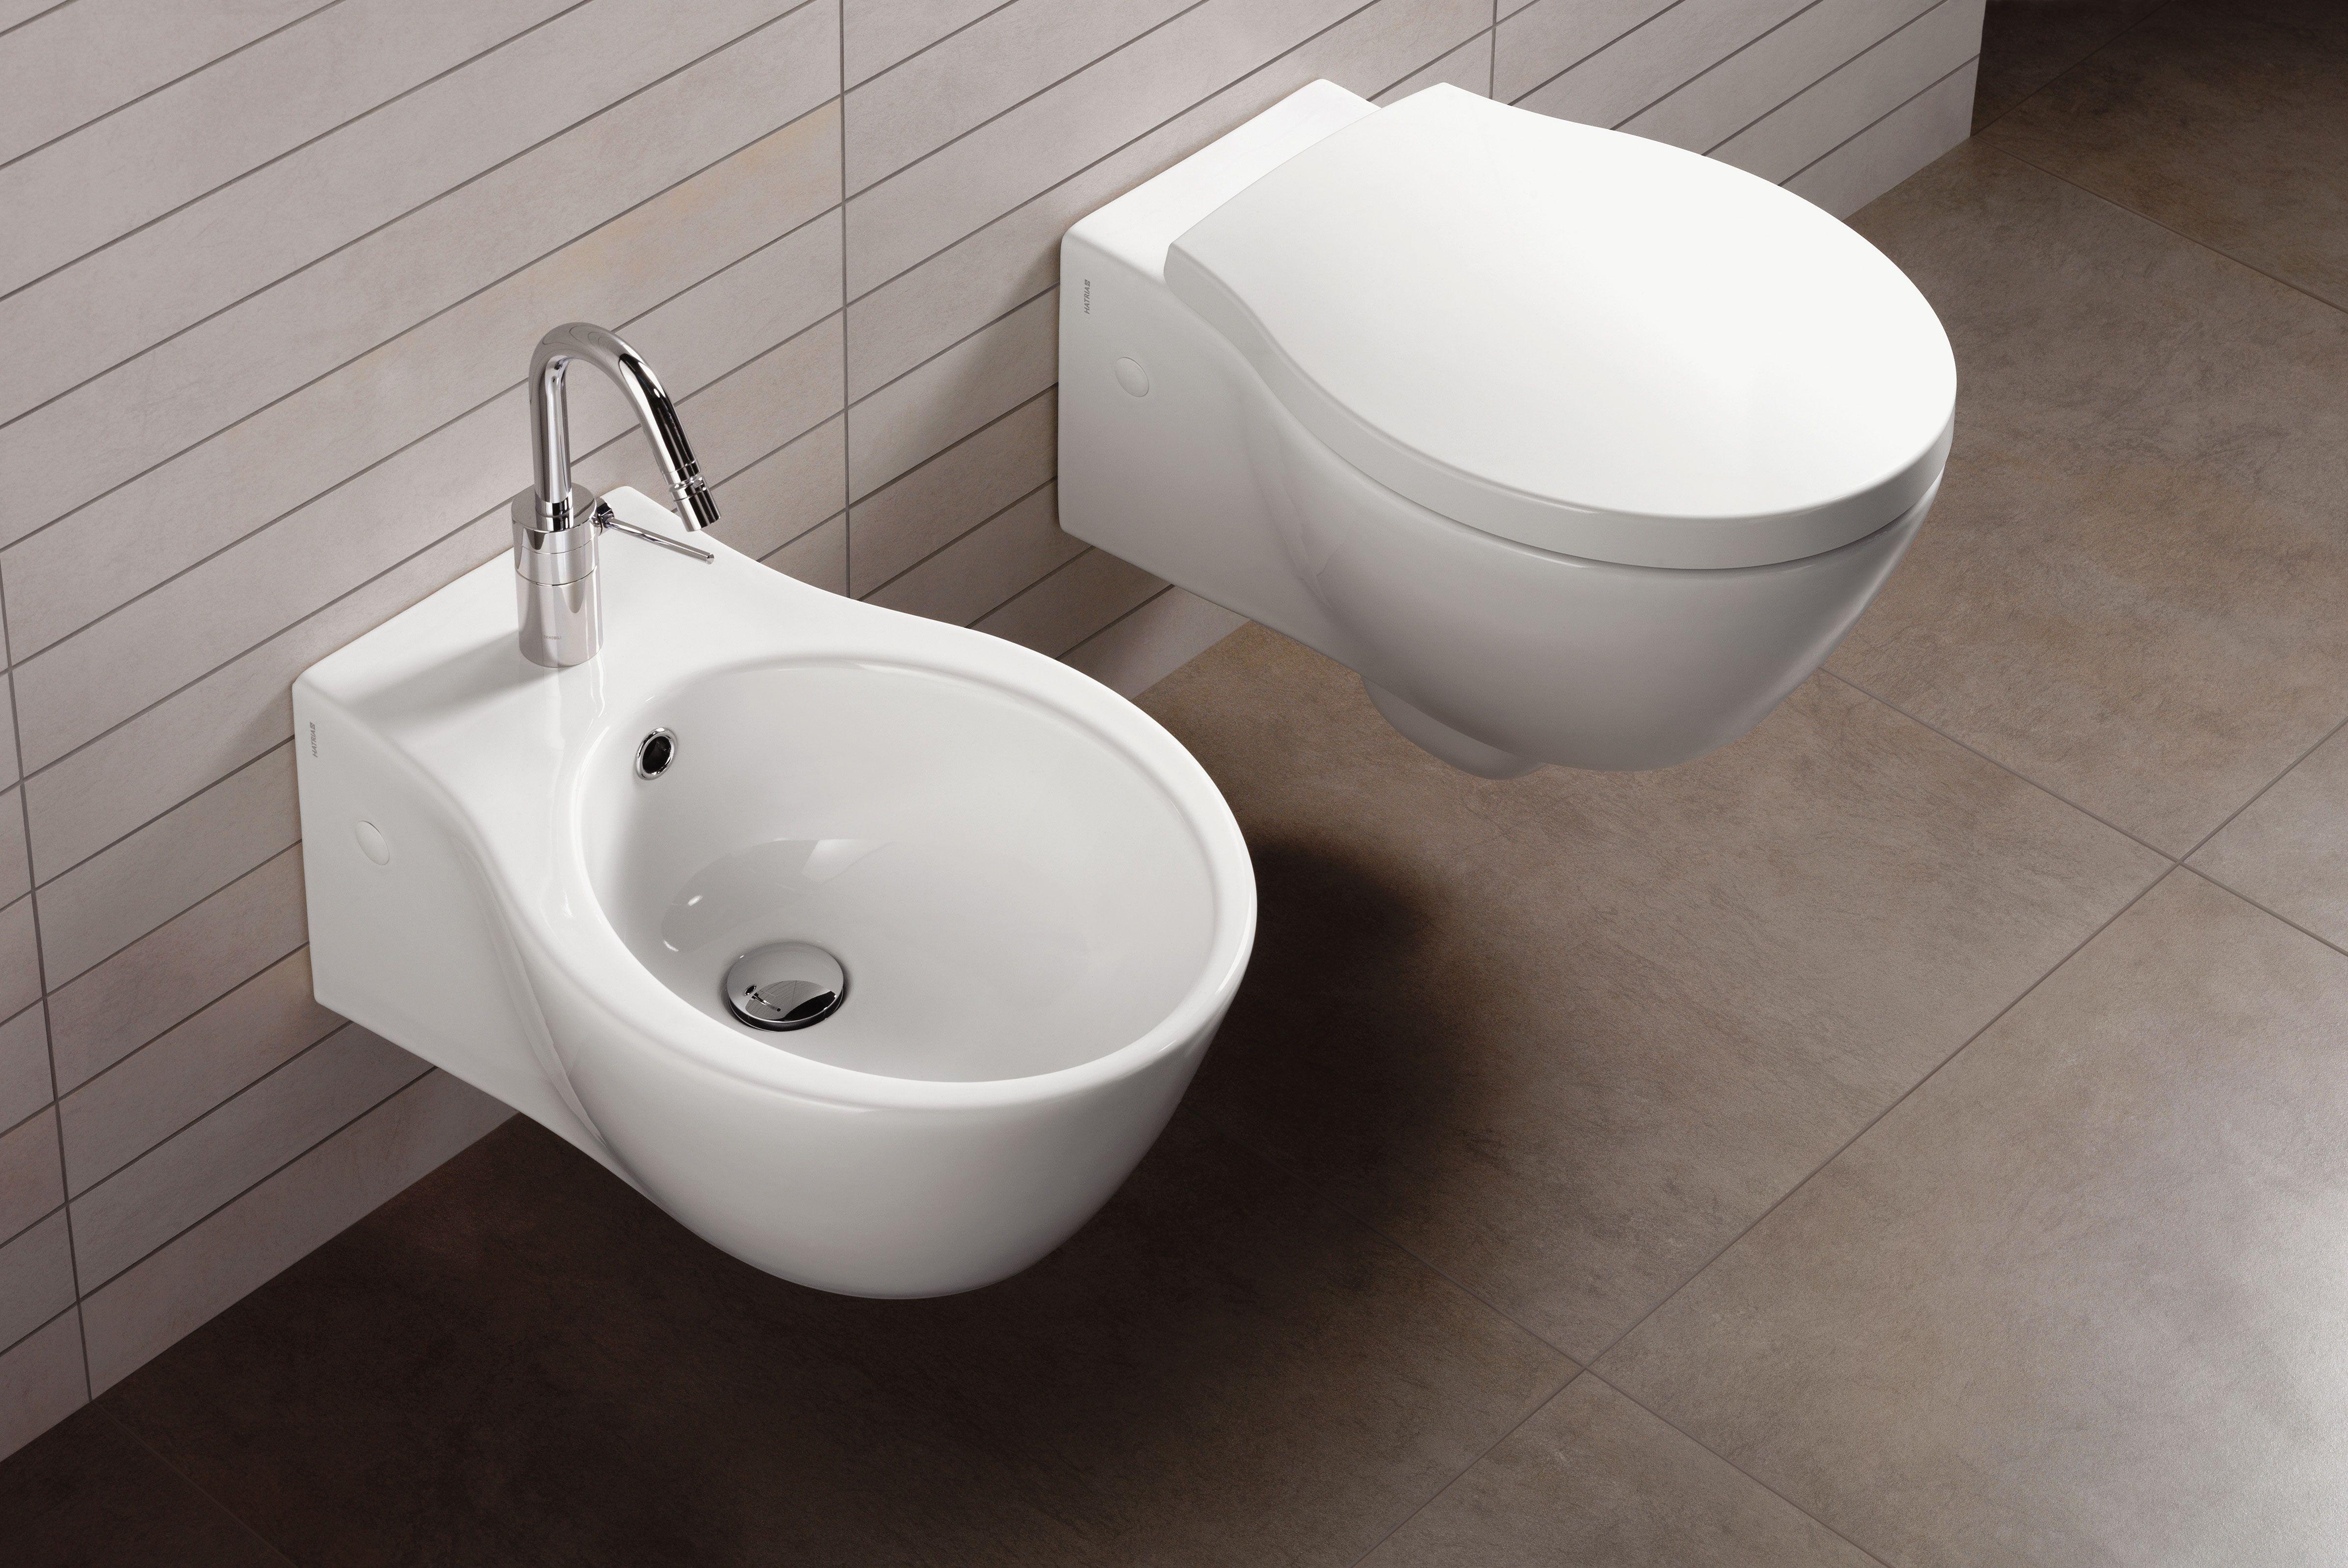 Hatria - Nido Сантехника | Hatria | Pinterest Toilette Und Bidet Design Hatria